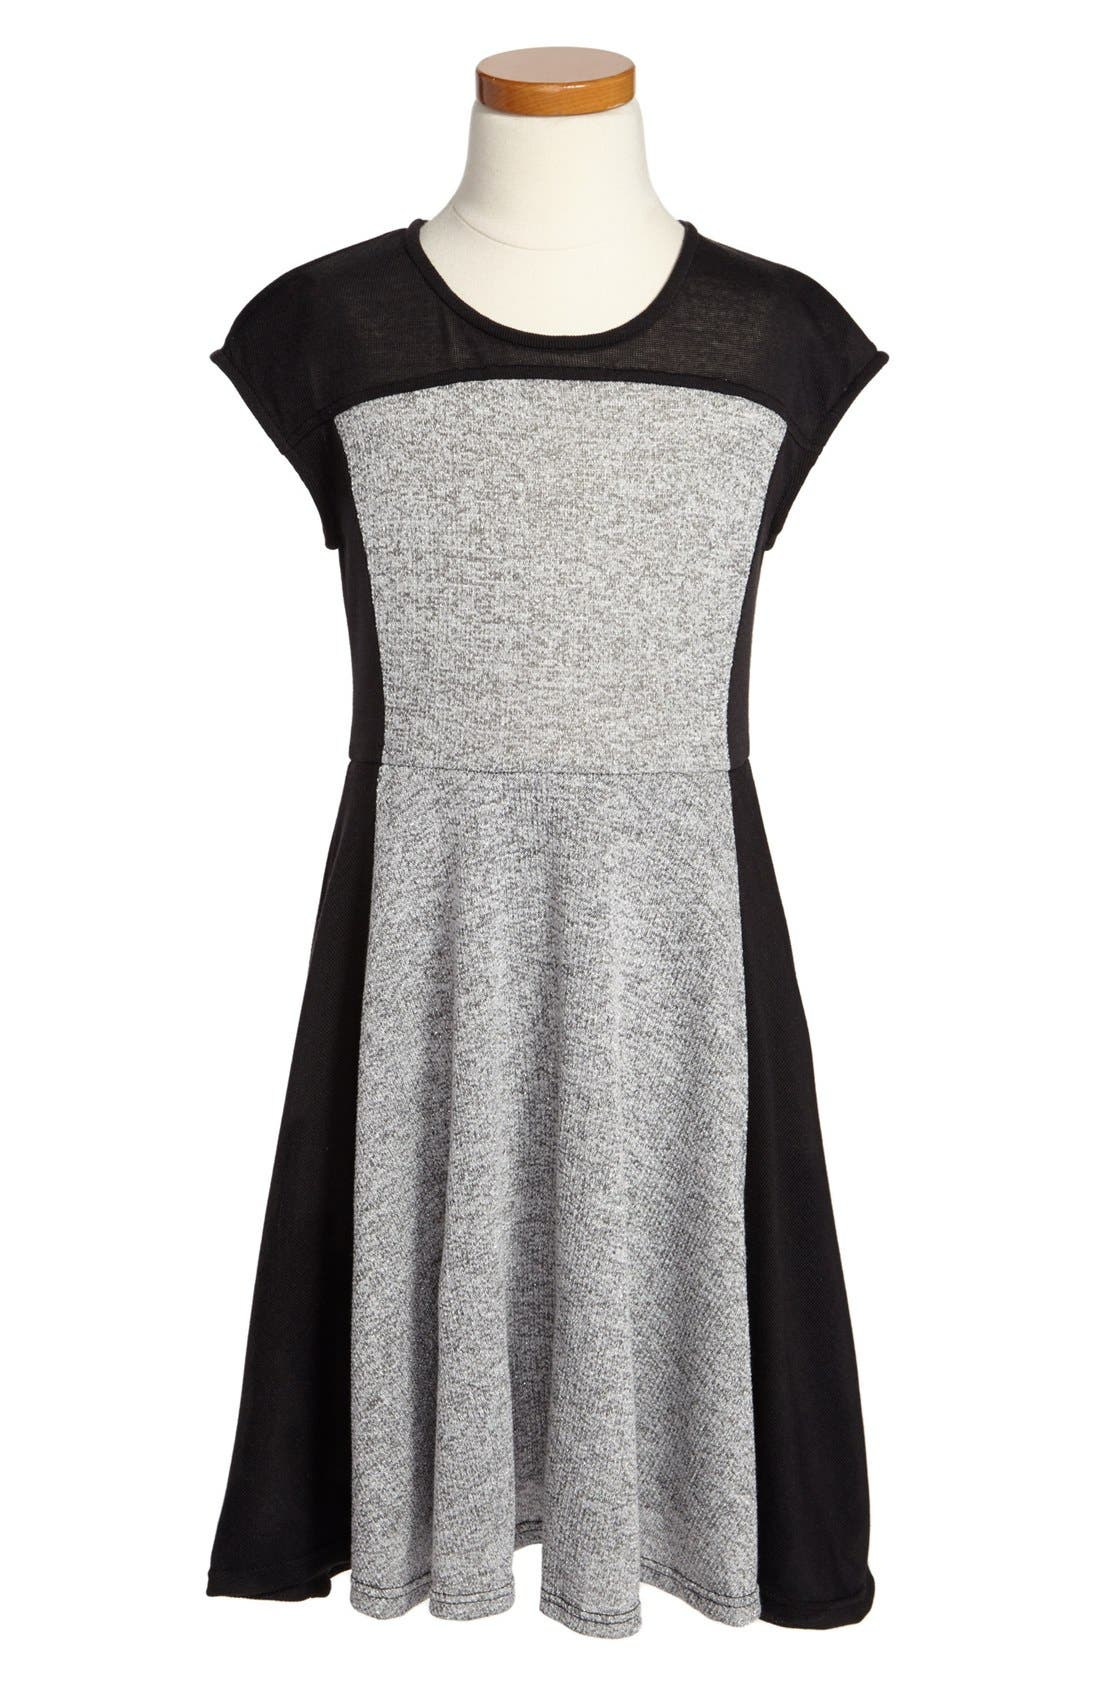 Alternate Image 1 Selected - Kiddo Knit Dress (Big Girls)